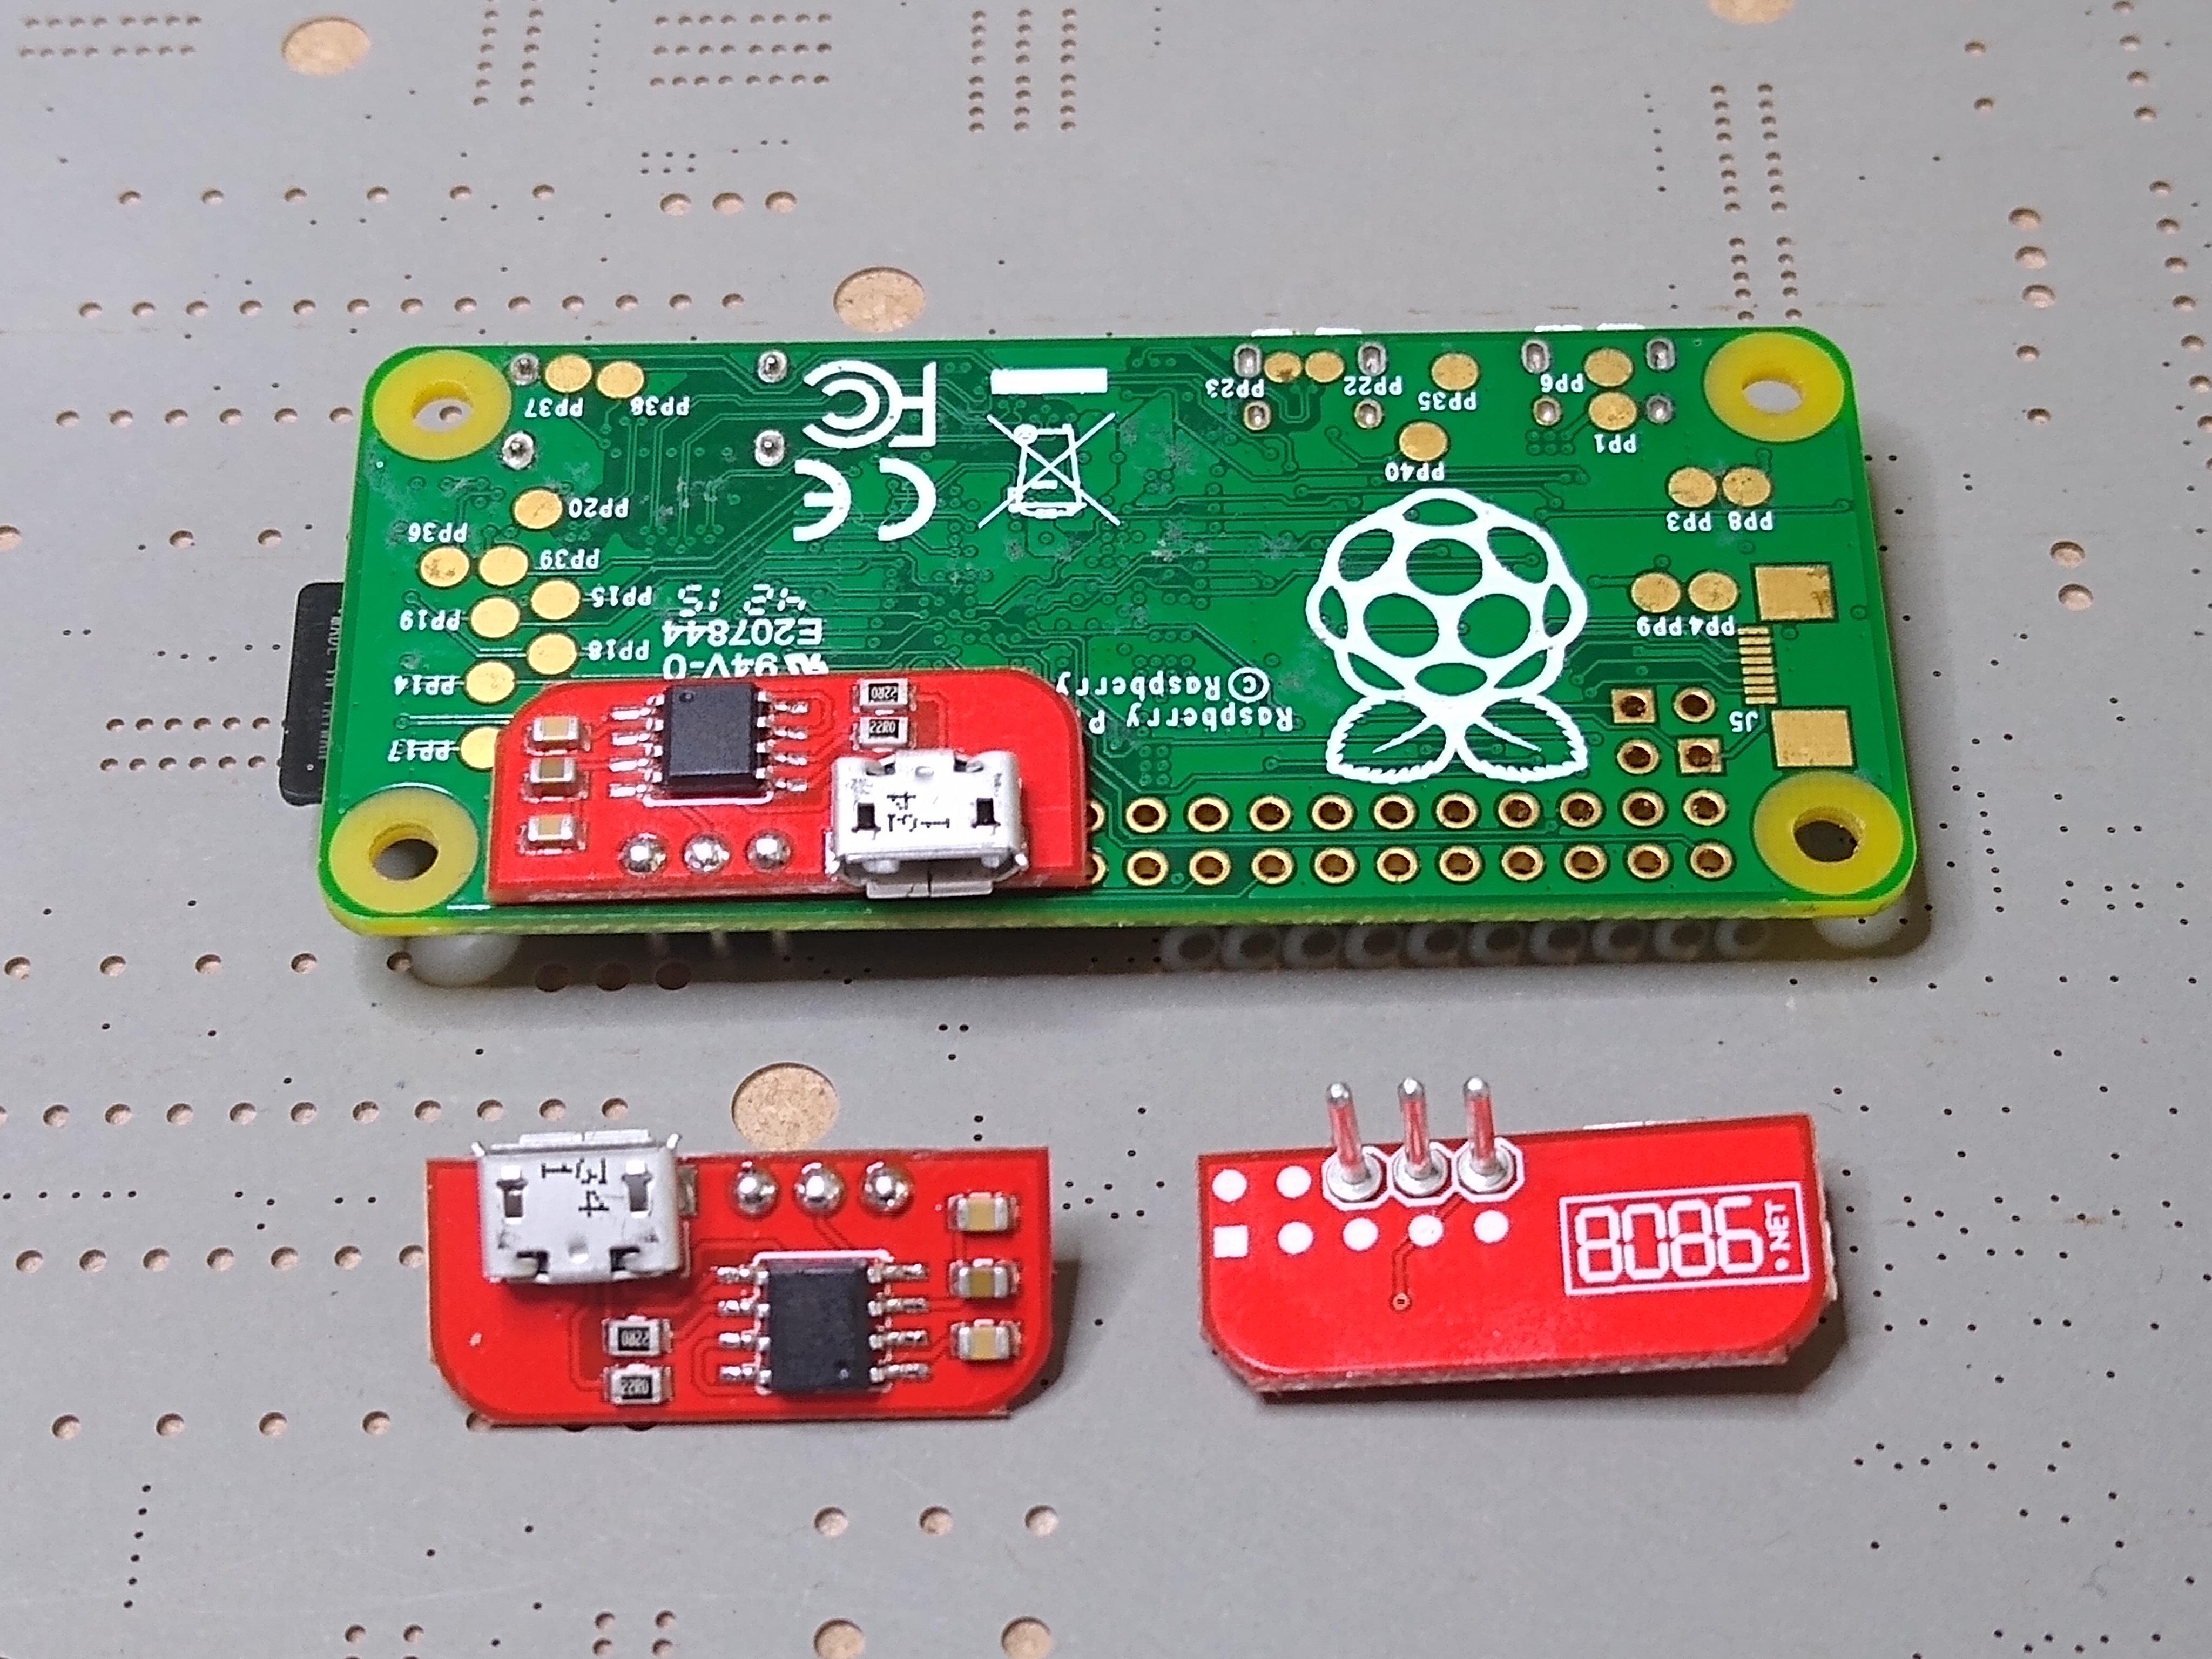 Solderless USB (CDC) Serial Adapter (Pi Zero)